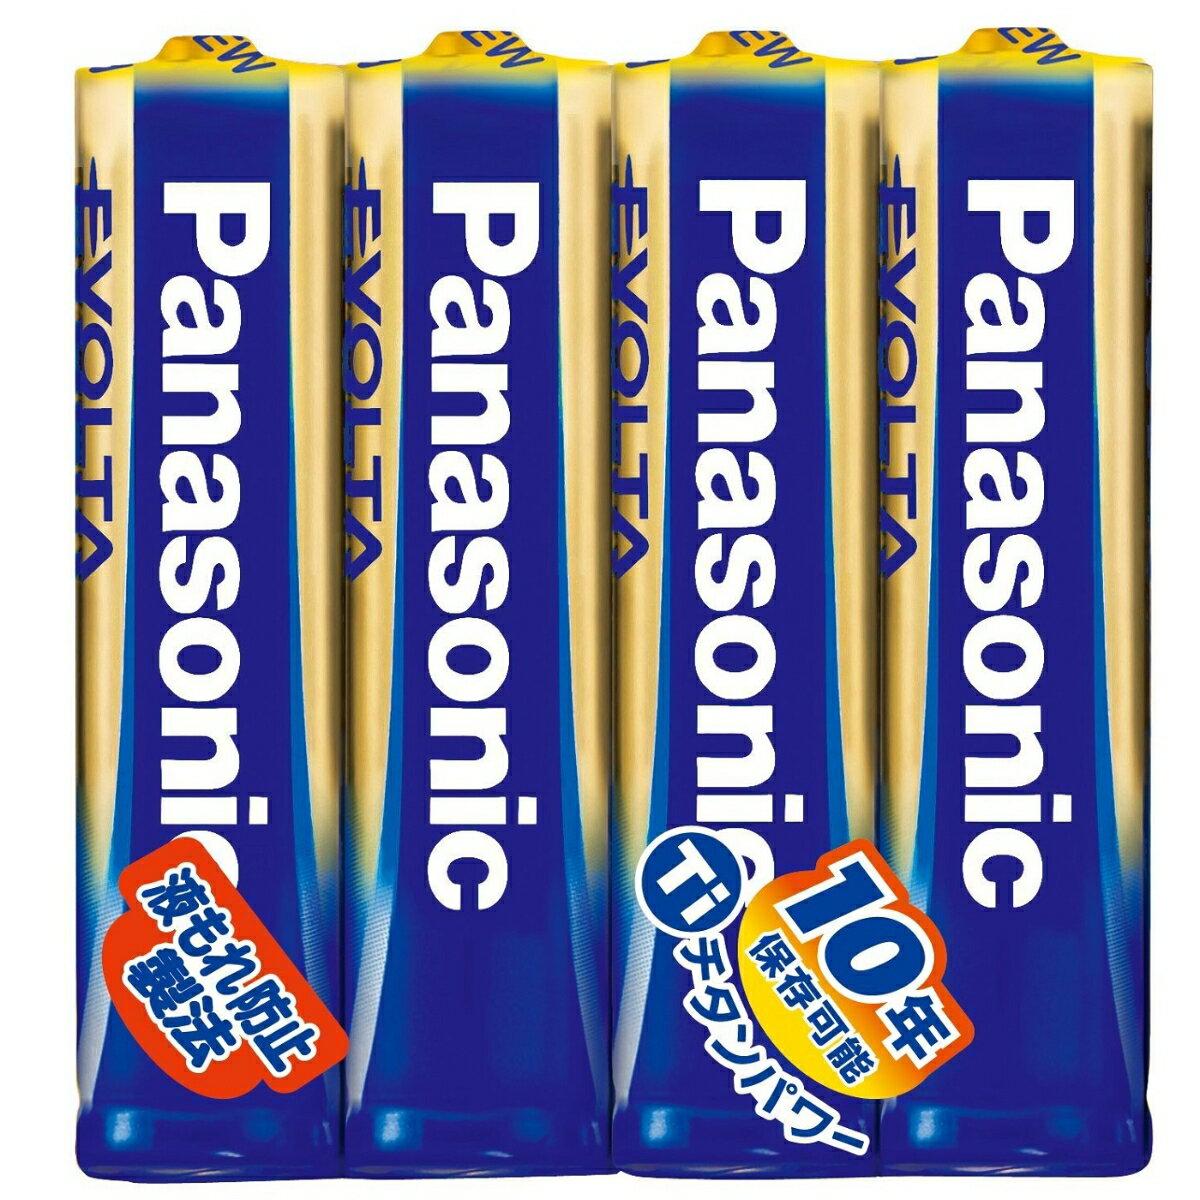 Panasonic エボルタ乾電池 単4形 4本シュリンクパック LR03EJ/4SE